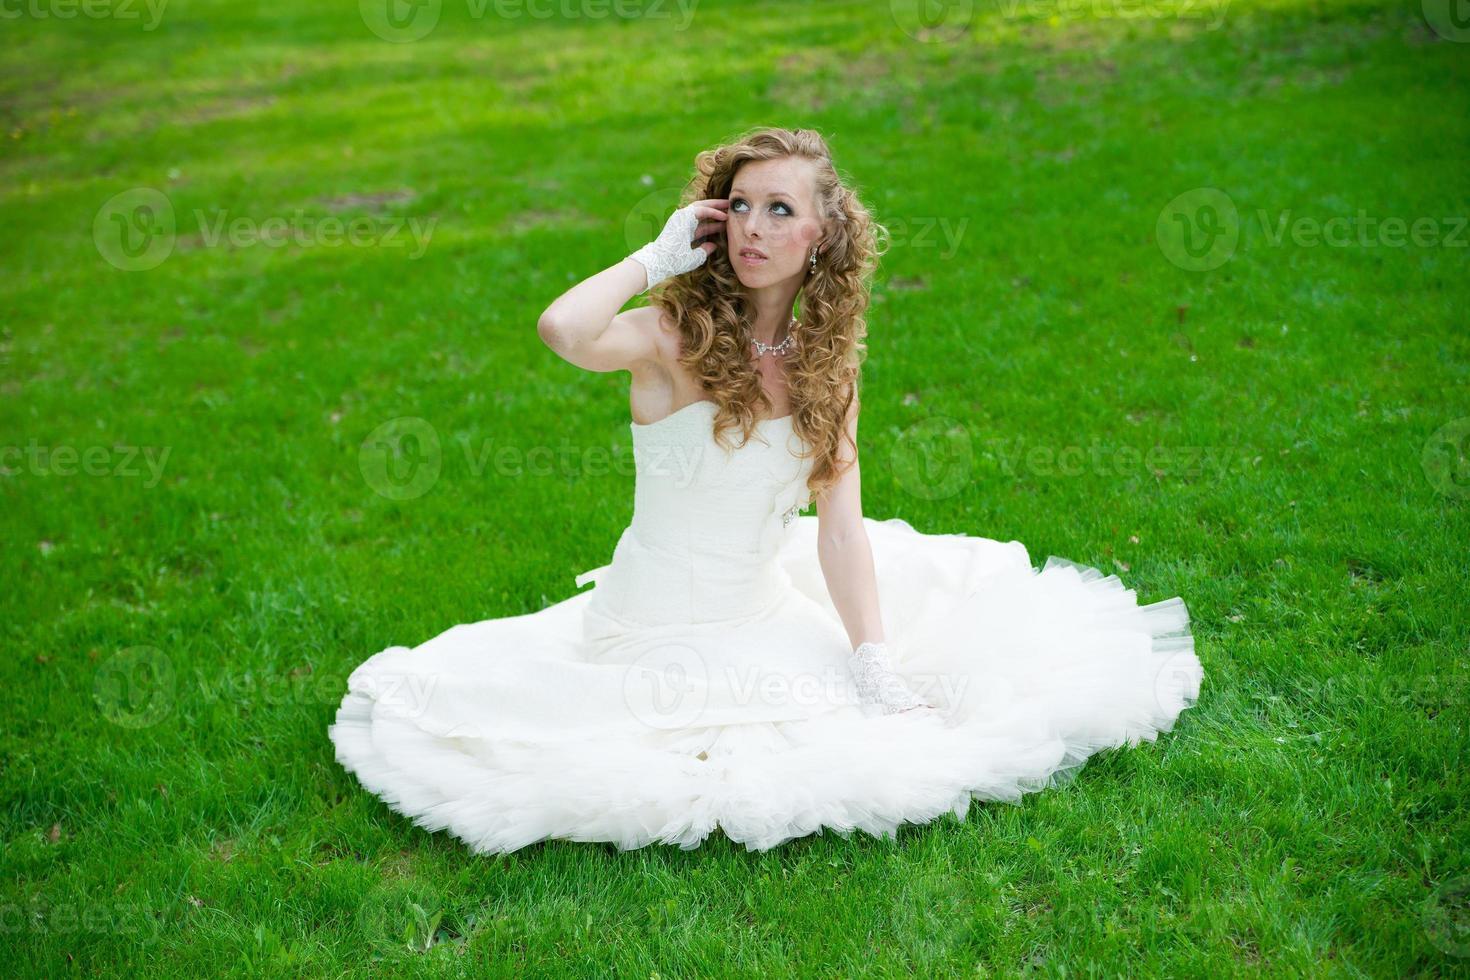 mooie bruid in een witte jurk op groen gras foto